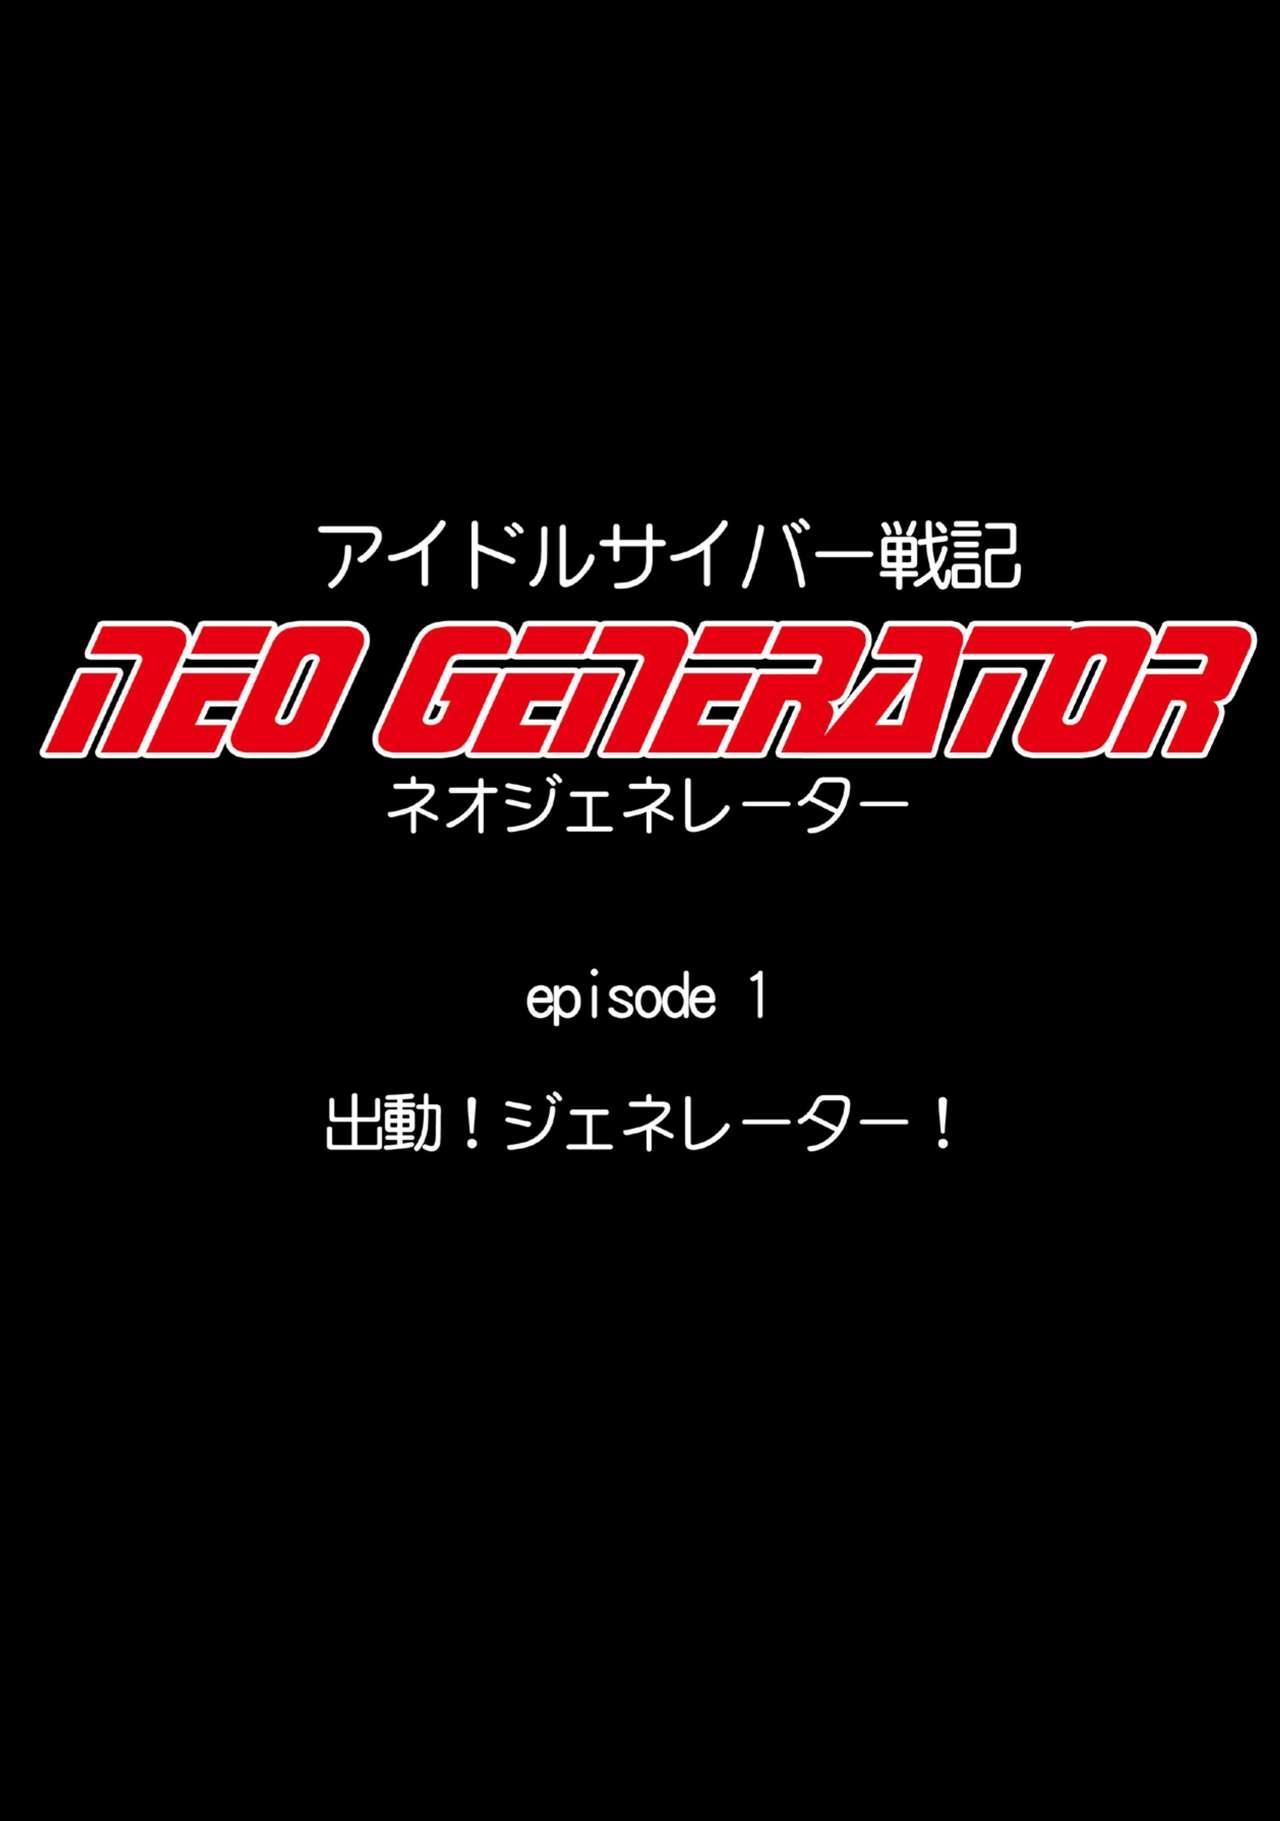 Idol Cyber Senki NEO GENERATOR episode 1 Shutsugeki! Neo Generator 54